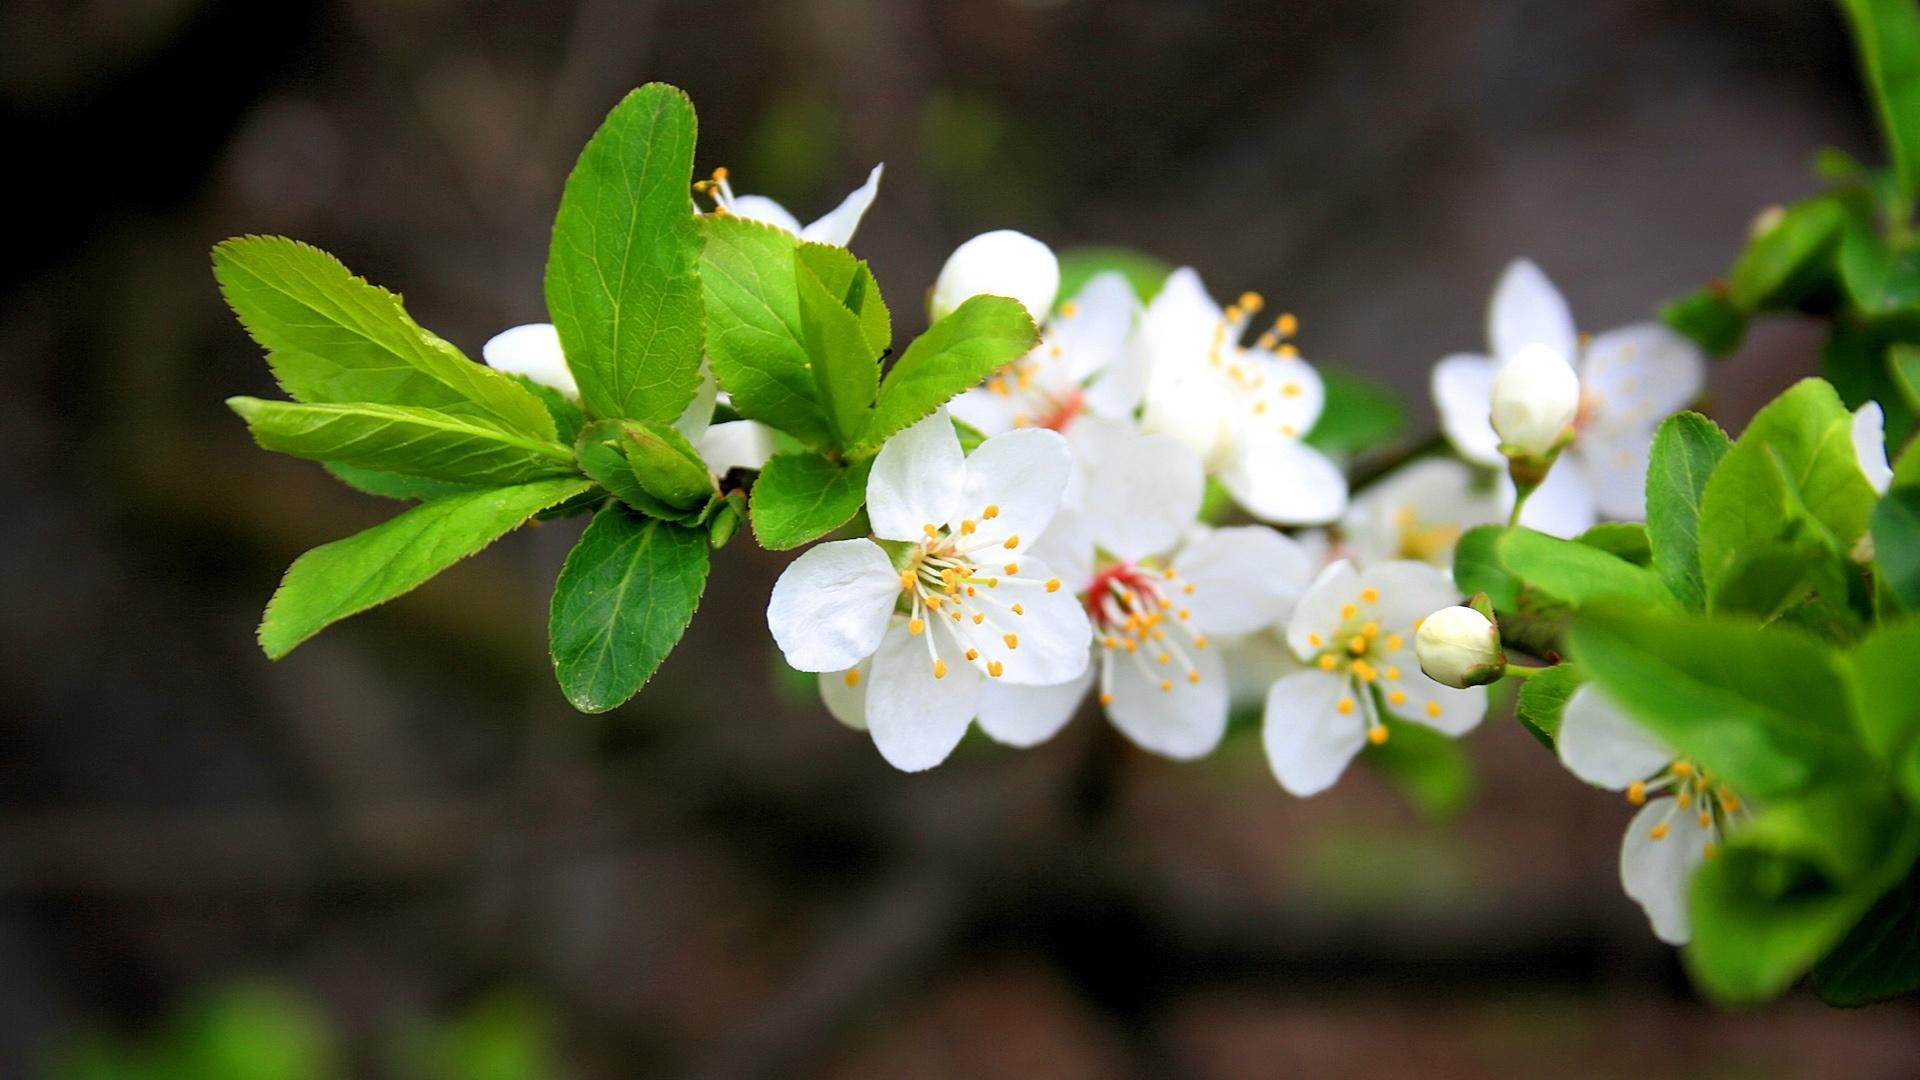 http://2.bp.blogspot.com/--BSx_-odGM0/TavkYrnPrkI/AAAAAAAACsE/UgiwIh_3sgU/s1920/HD+Flowers+1+(1).jpg